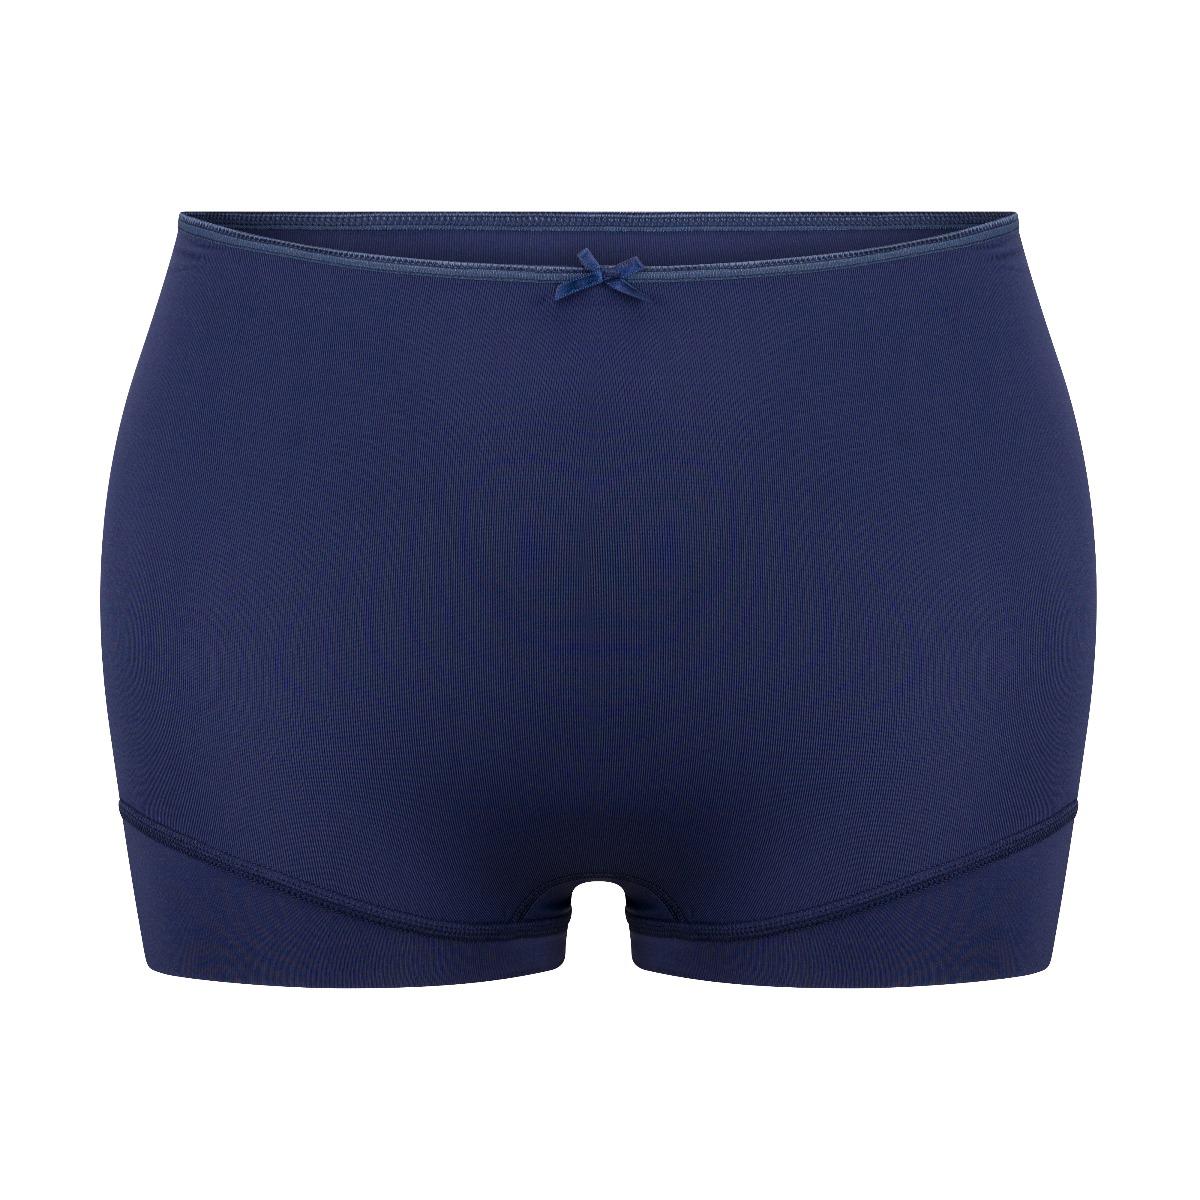 RJ Pure Color Dames Short Extra Hoog Donkerblauw XL